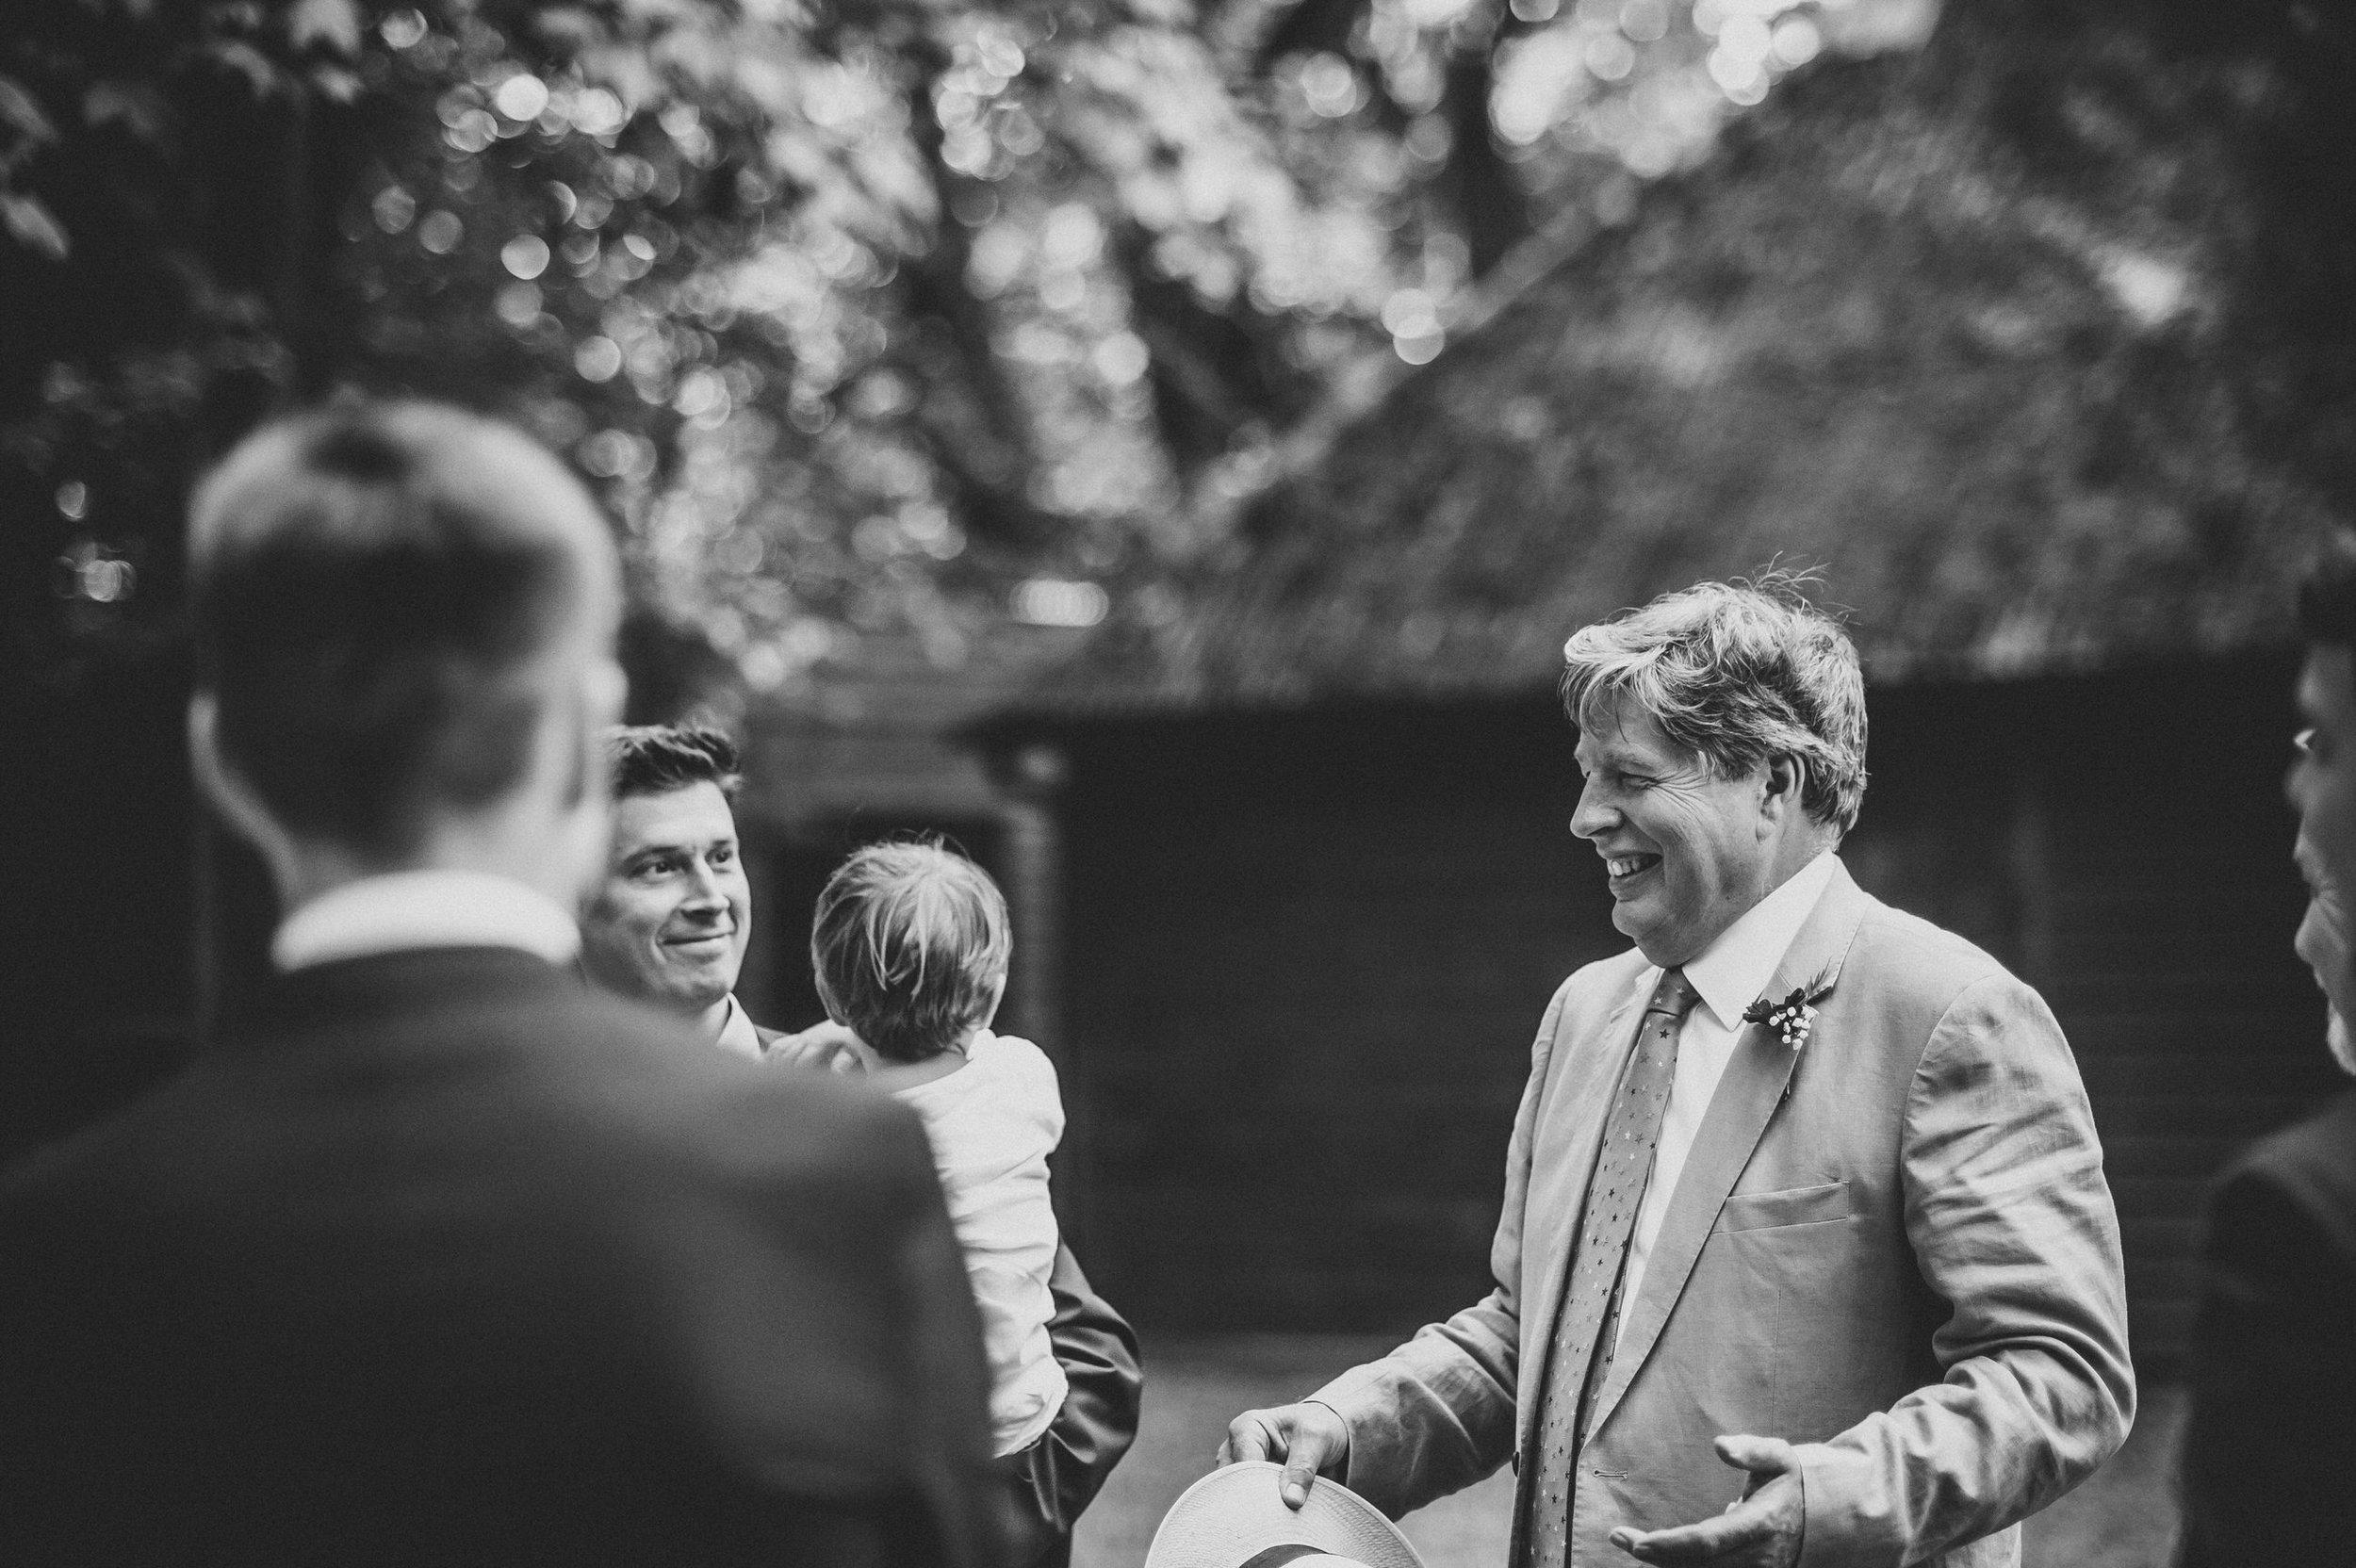 knepp-castle-boho-outdoor-wedding-81.jpg